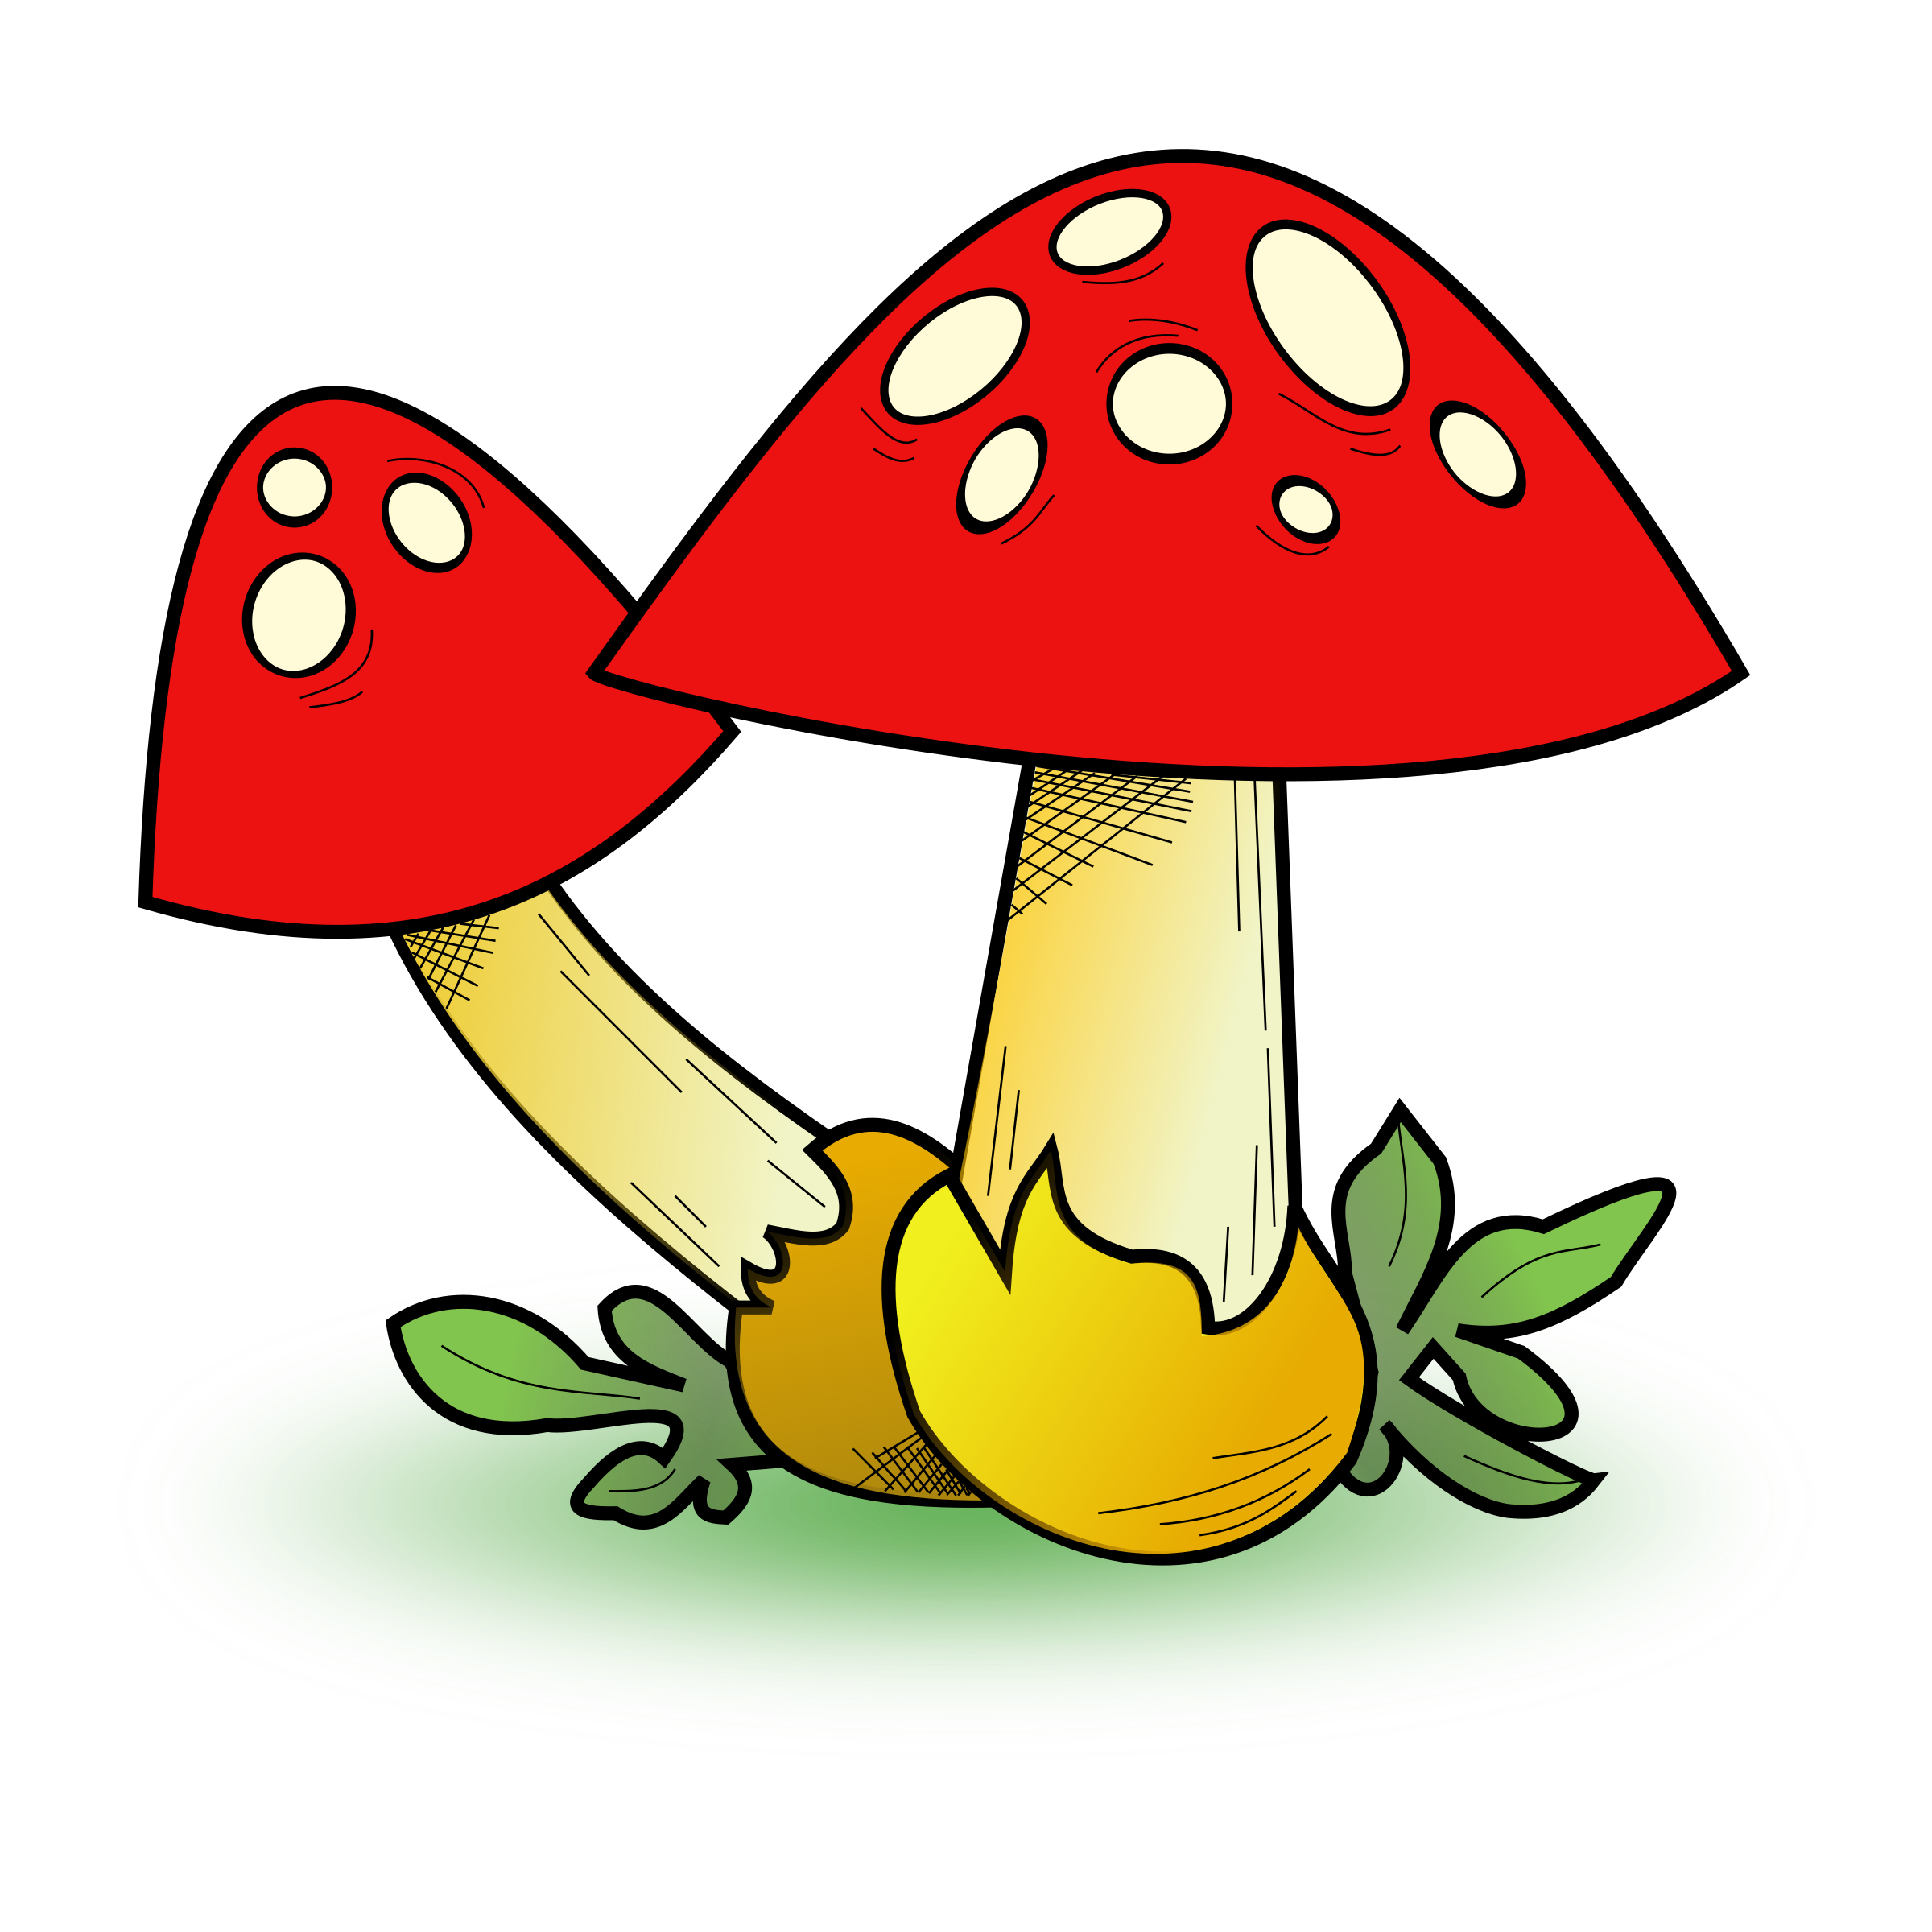 Mushrooms clipart fungus. Fungal forest big image